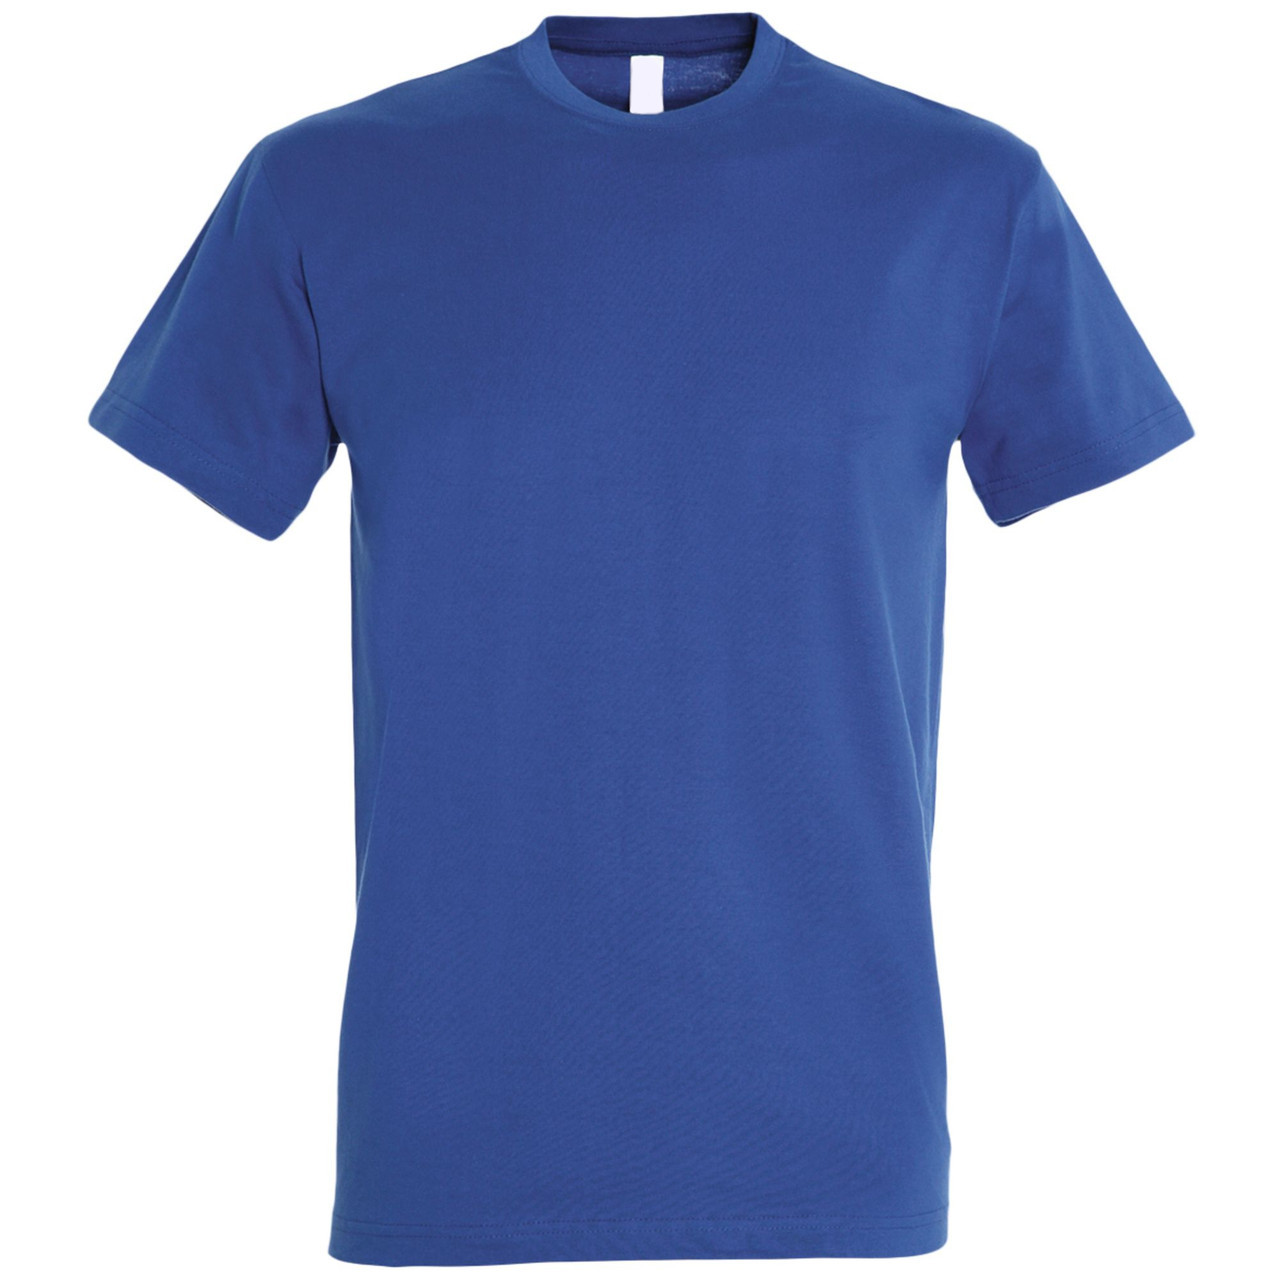 Oднотонная футболка   Синяя   160 гр.   S